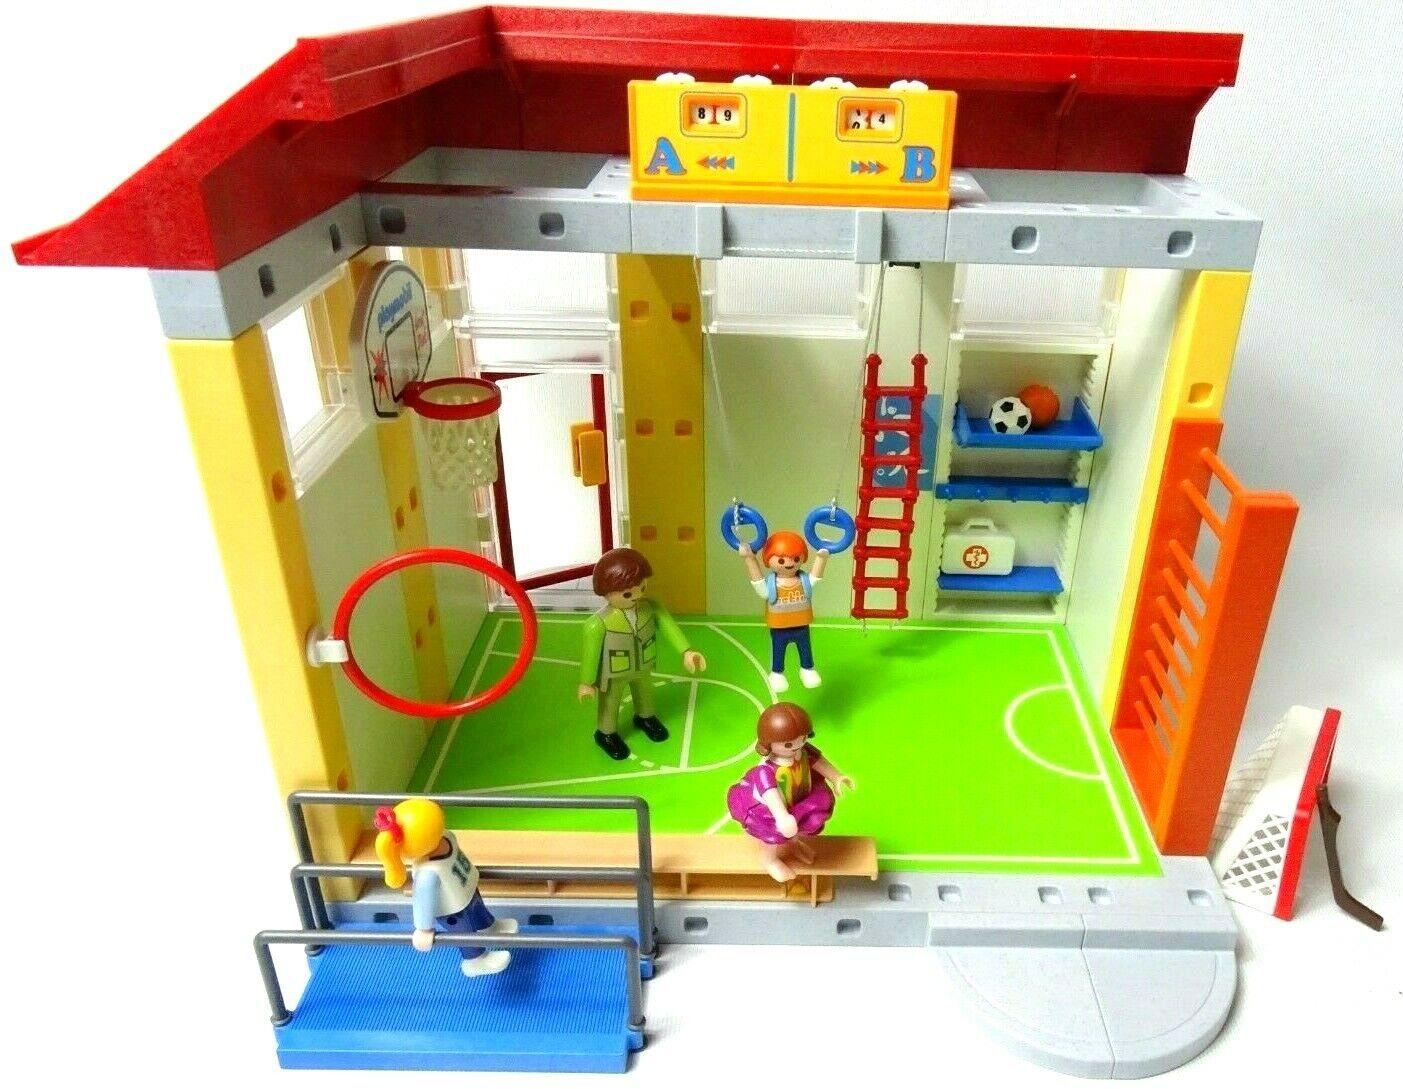 Playmobil 4325 École Gym avec boite-RARE interrompu objet & Extra Figure